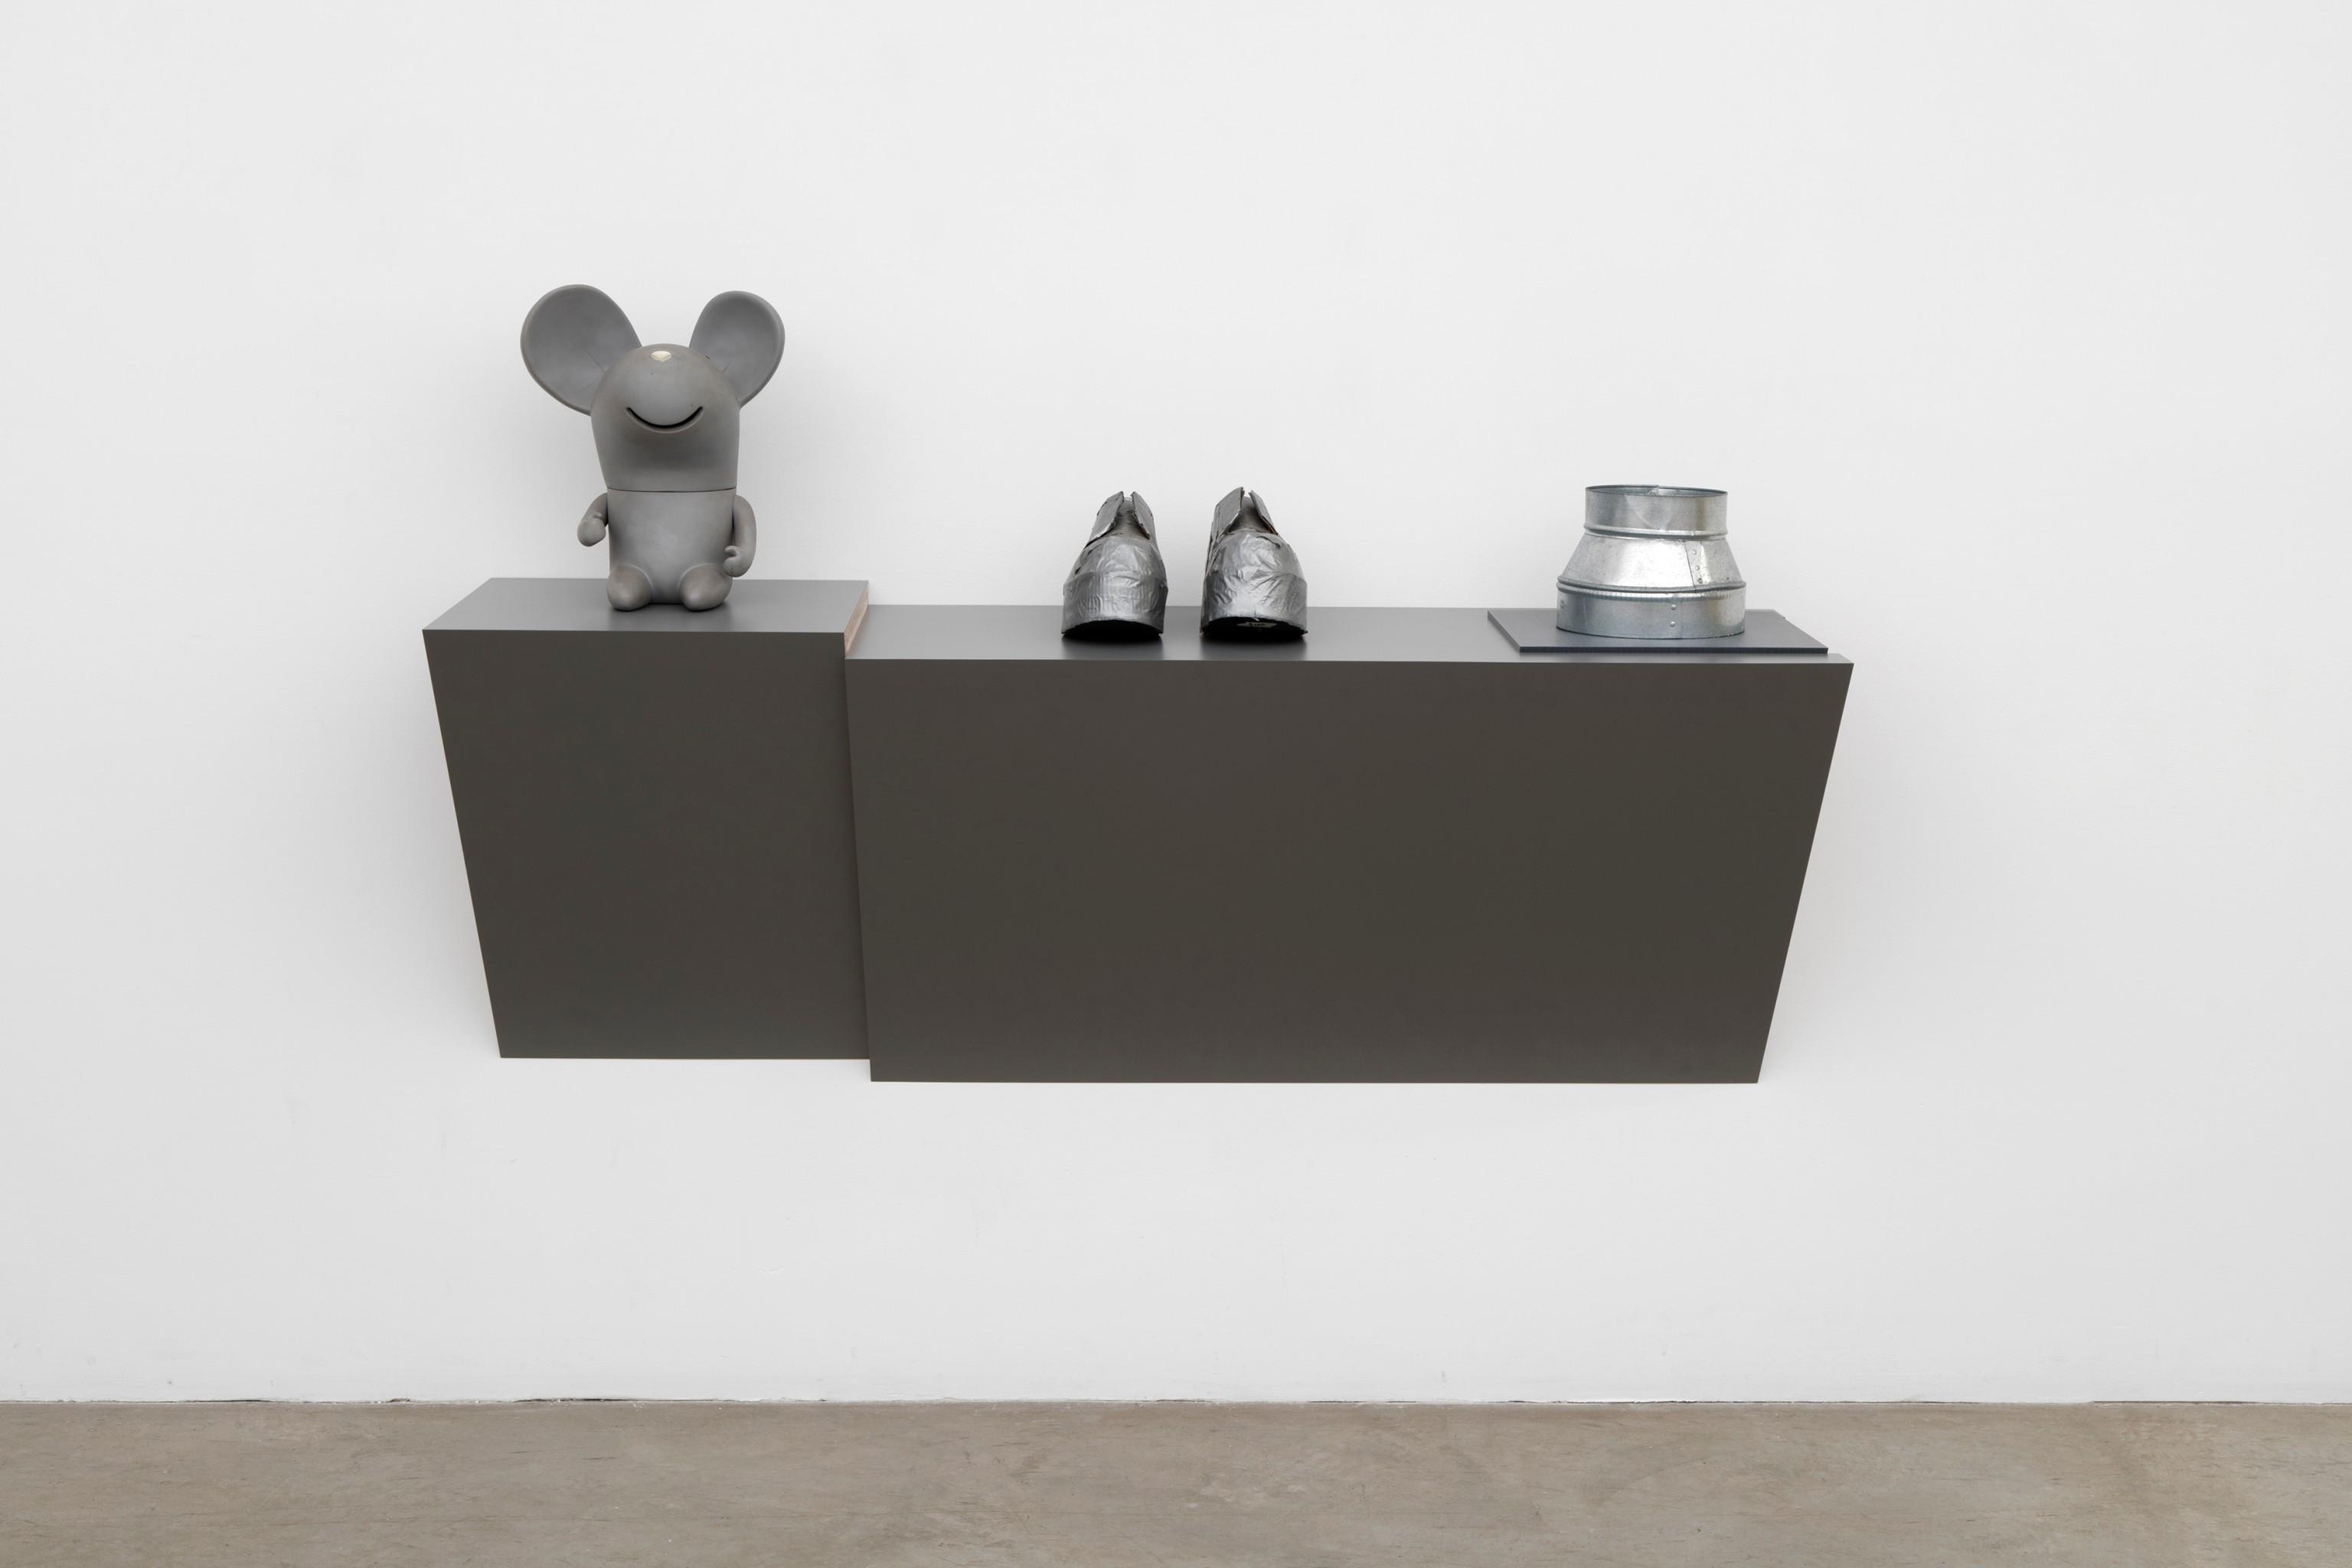 Best Galleries to Explore at Art Basel Miami 2018 - Haim Steinbach tanya bonakdar Best Galleries to Explore at Art Basel Miami 2018: Tanya Bonakdar Best Galleries to Explore at Art Basel Miami 2018 Haim Steinbach